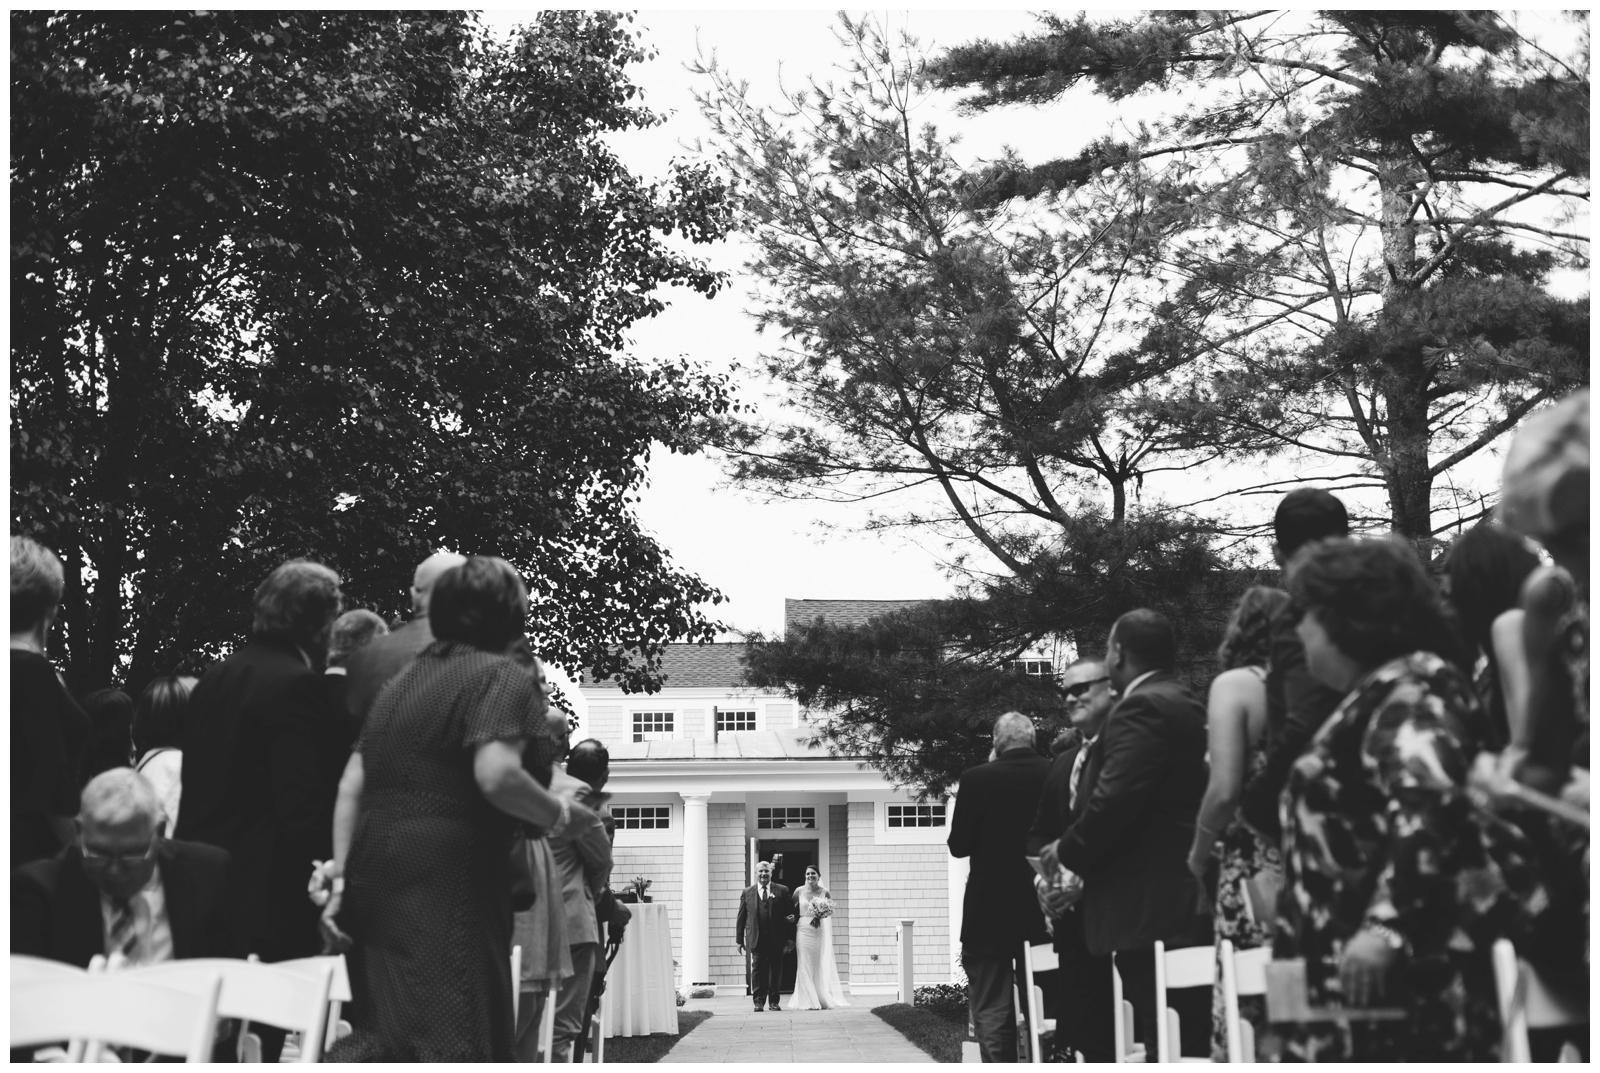 Bailey-Q-Photo-Pine-Hills-Pavilion-Wedding-Boston-Wedding-Photographer-049.jpg